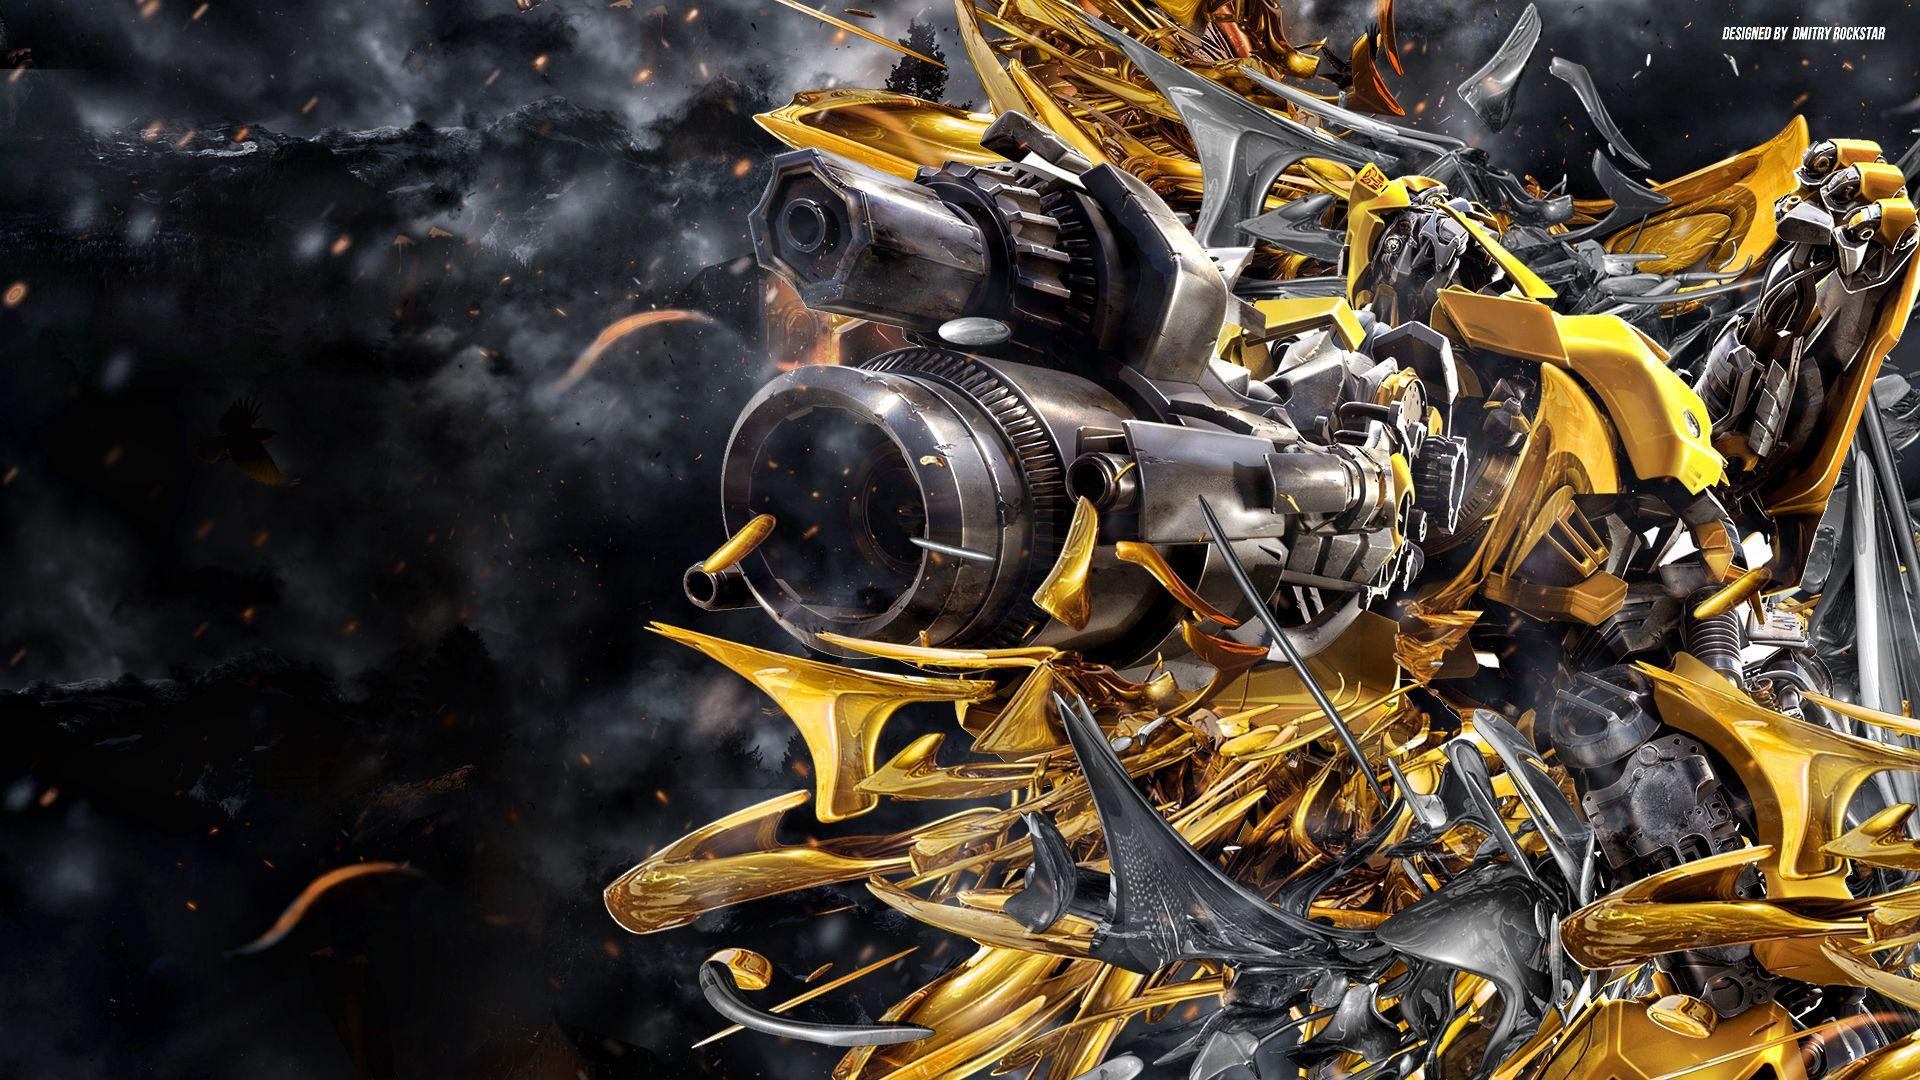 Transformers 4 Bumblebee Wallpaper HD Dlwallhd